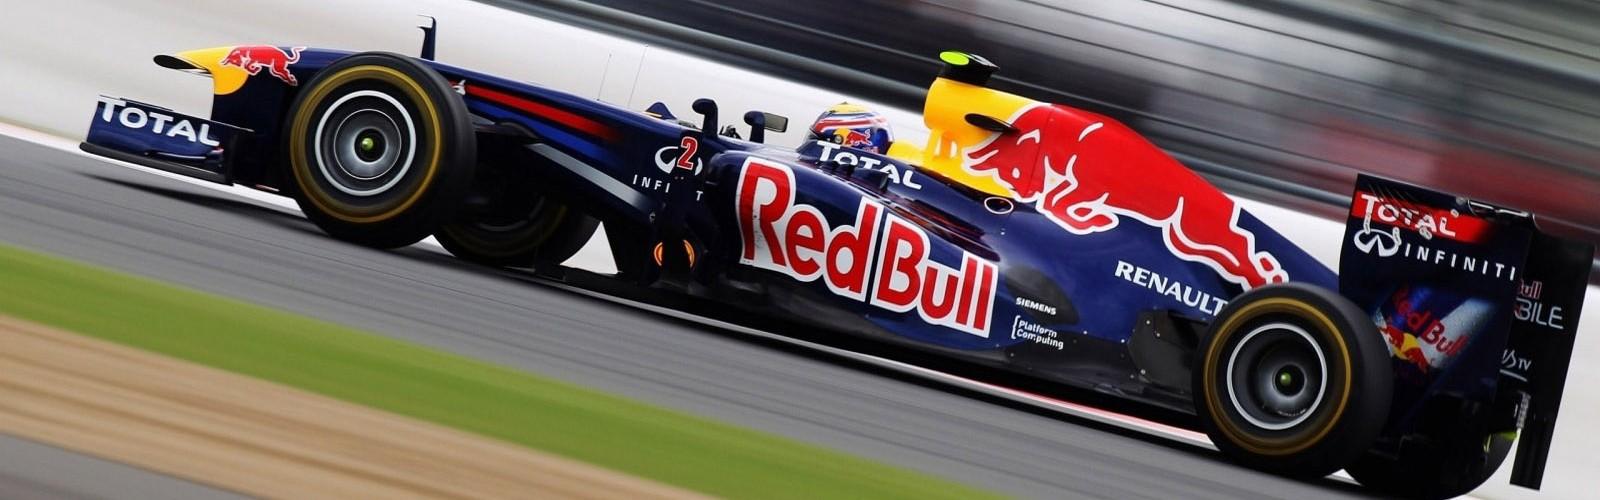 Formula race car wrap